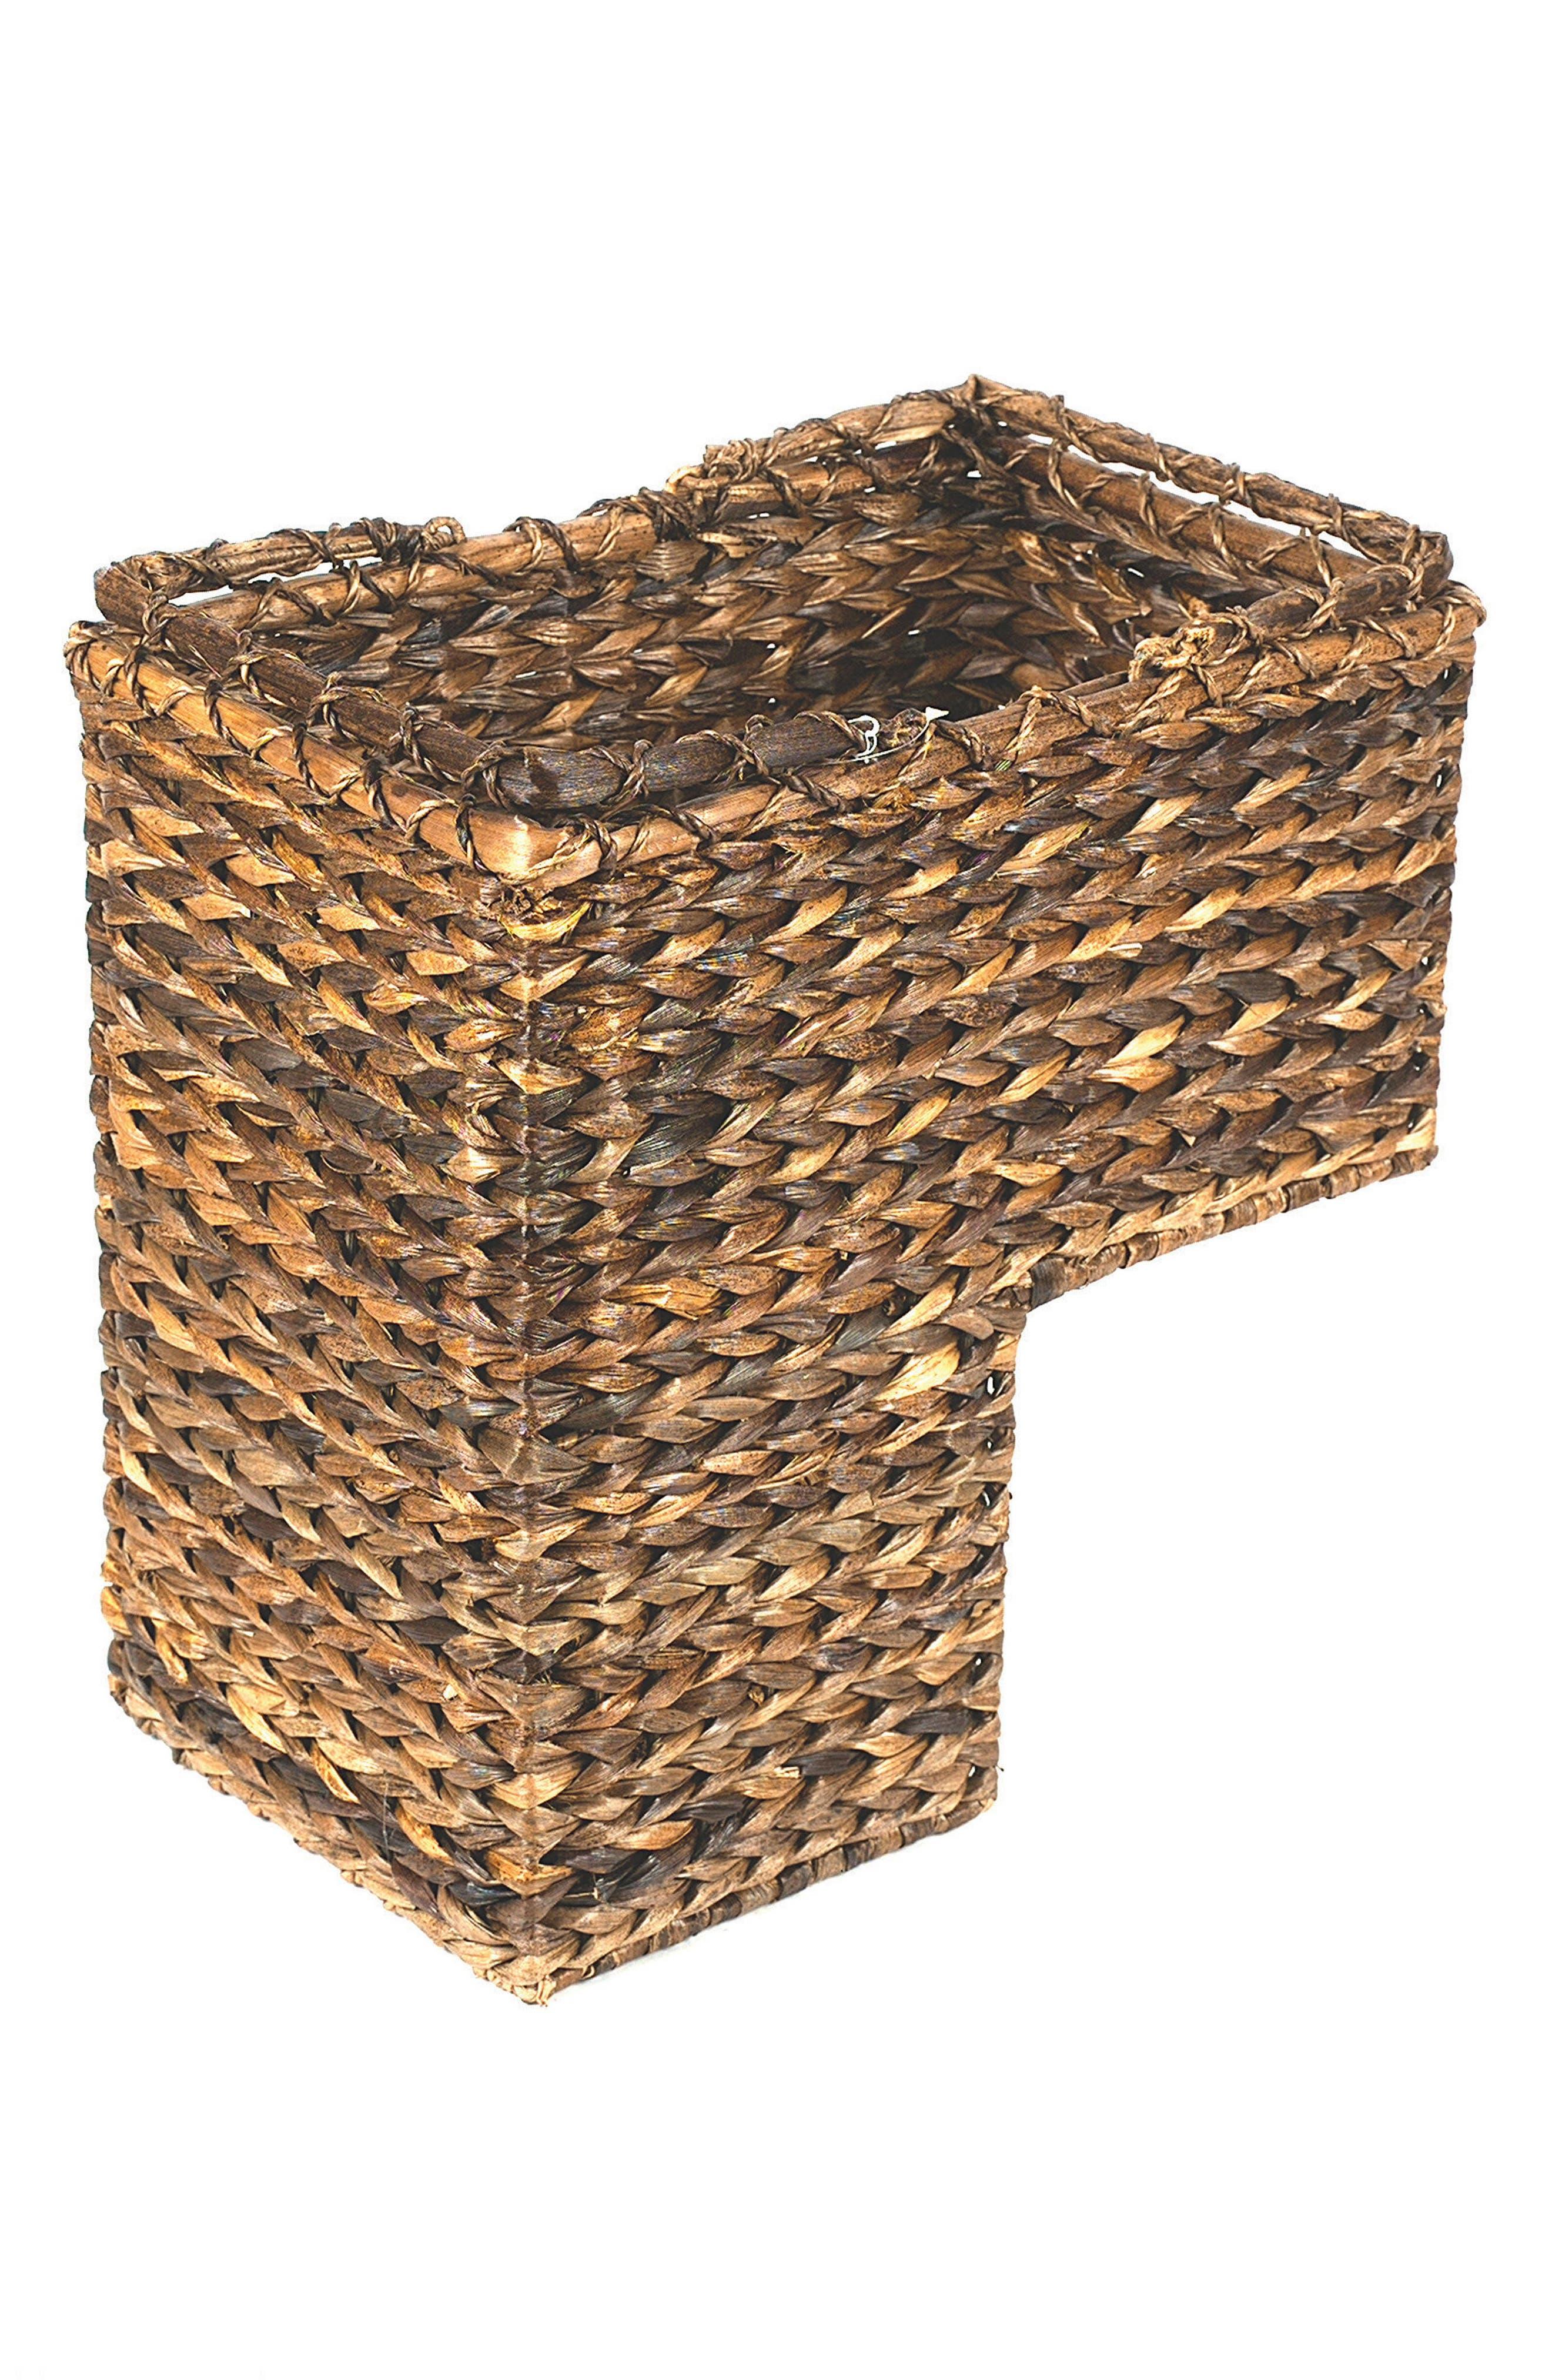 Main Image - Creative Co-Op Stair Basket